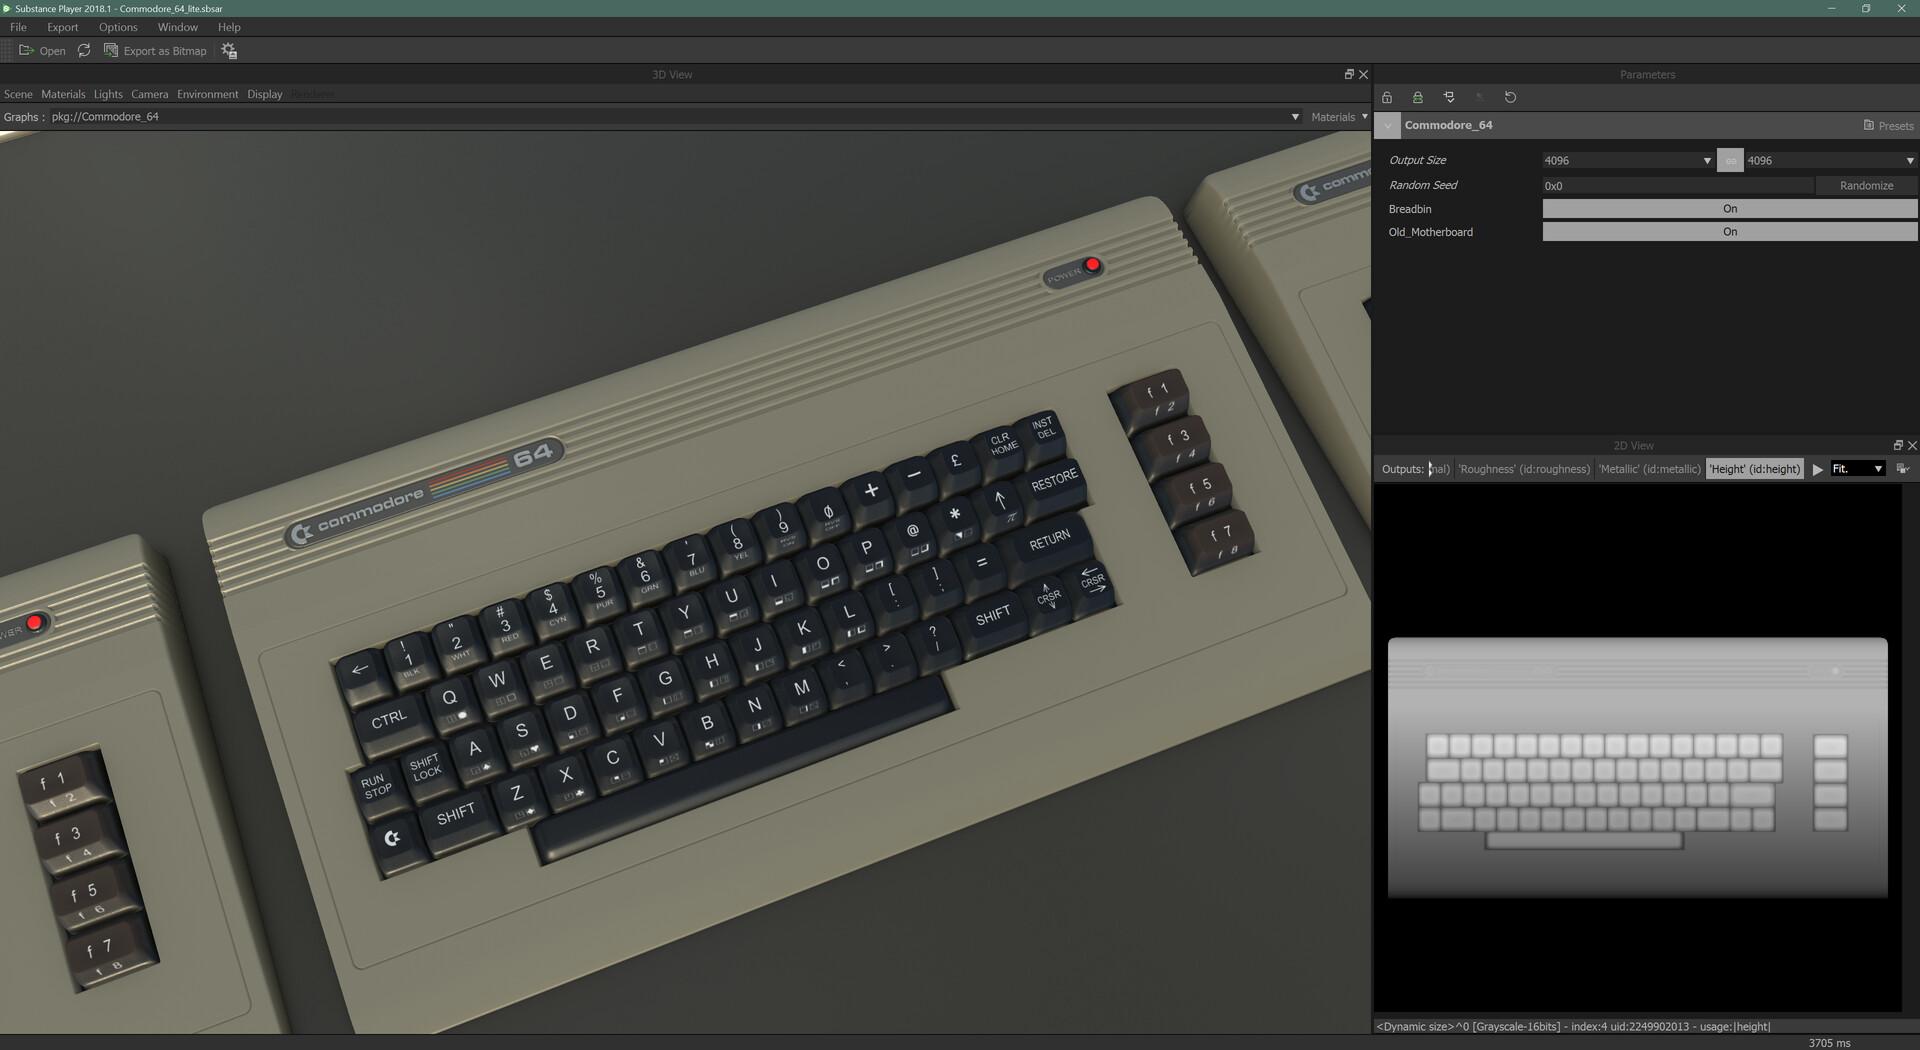 Cem tezcan screenshot20190223 005